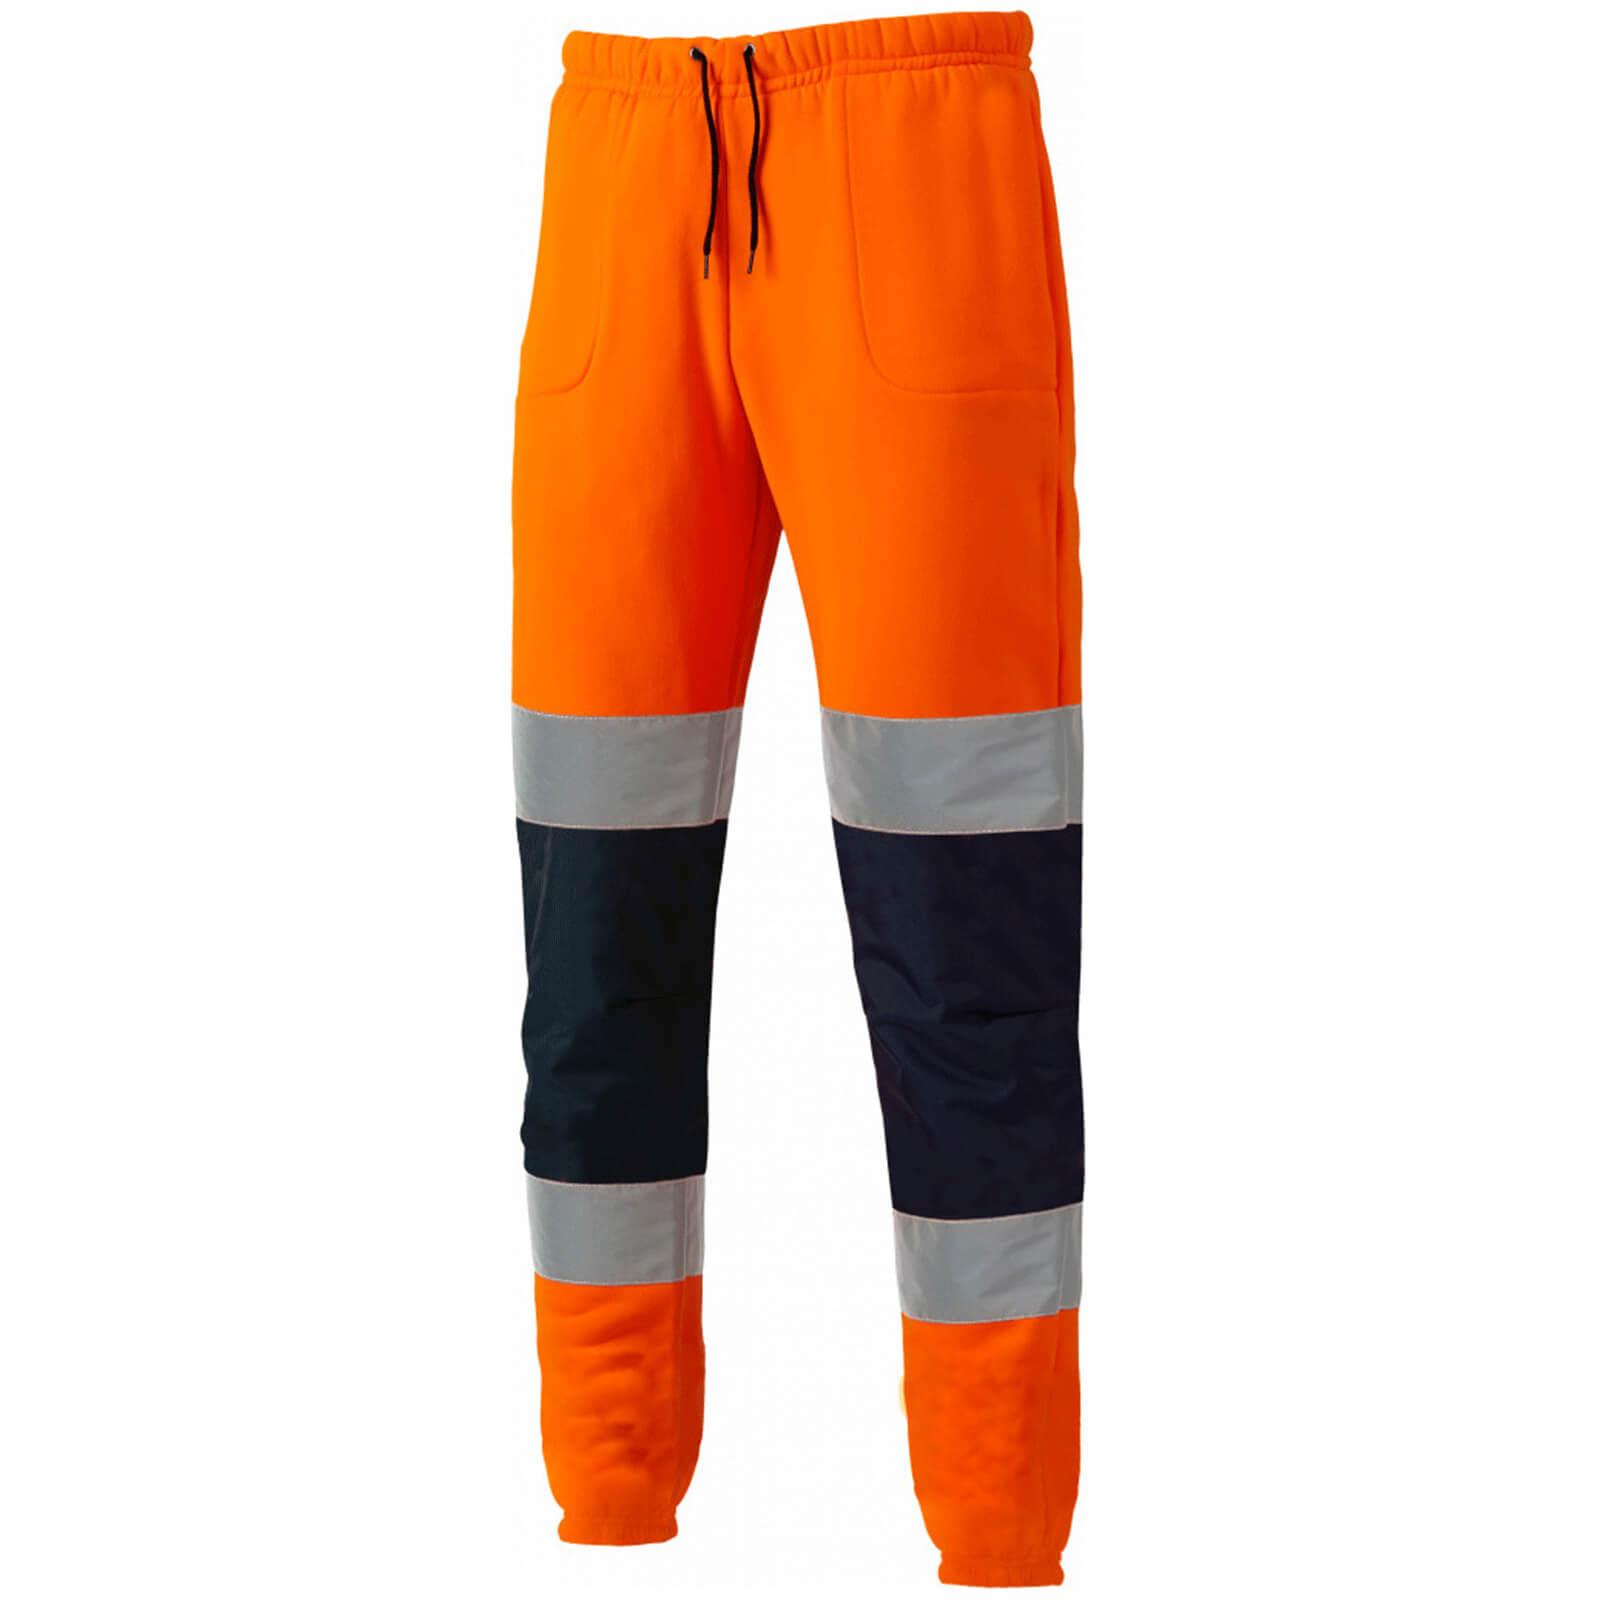 Image of Dickies High Vis Jogger Orange / Navy 2XL